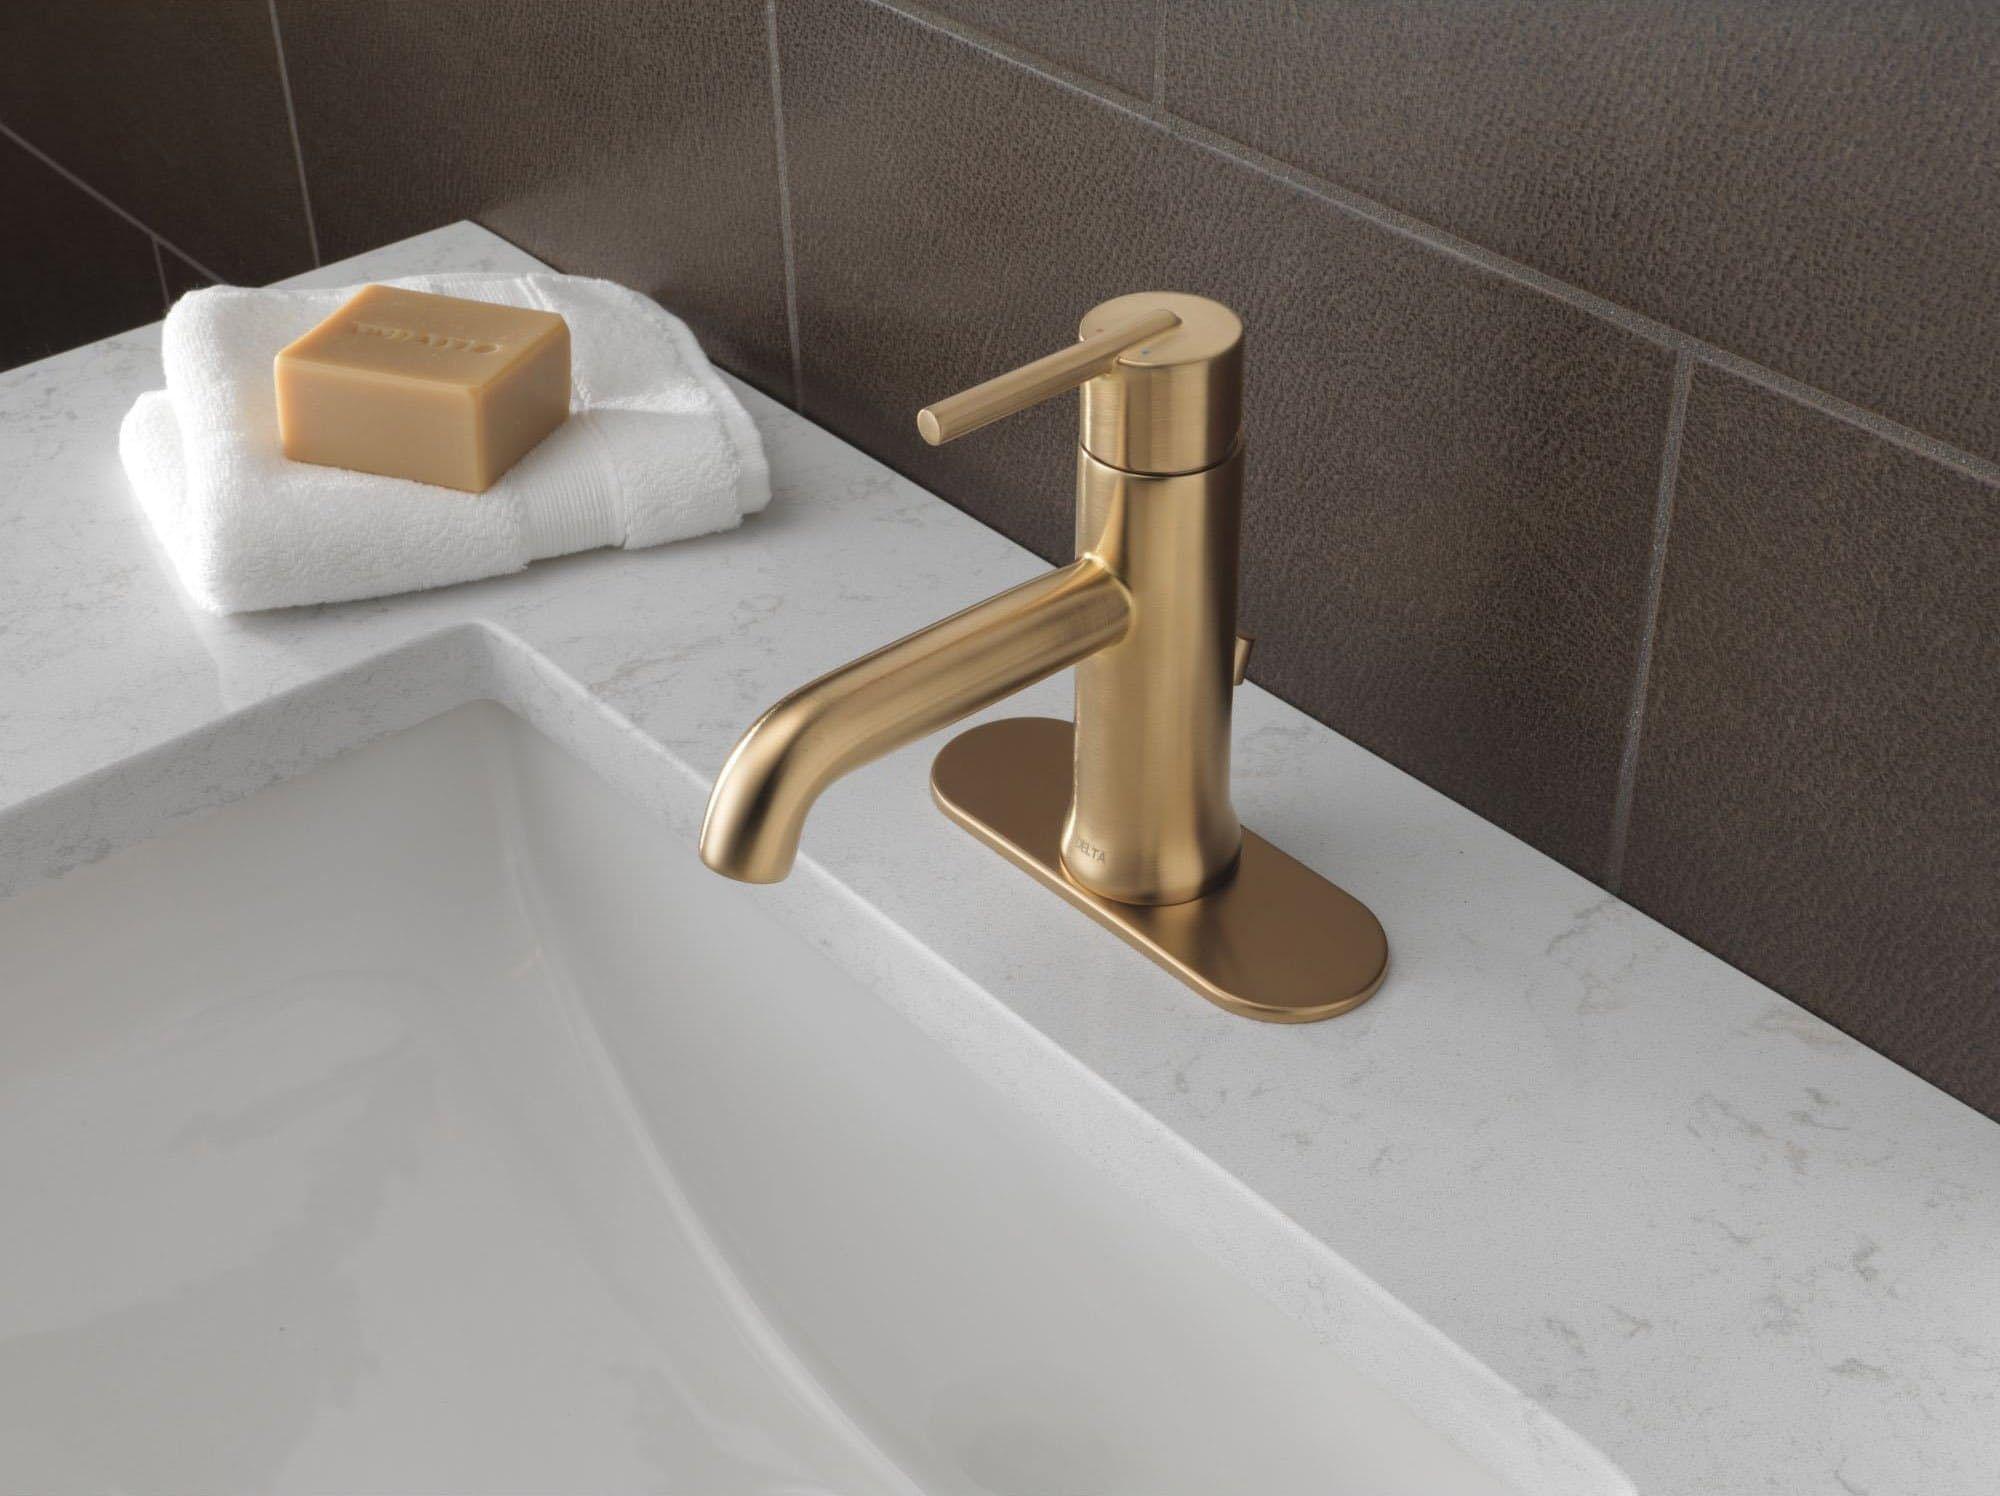 brass fixtures for the bathroom